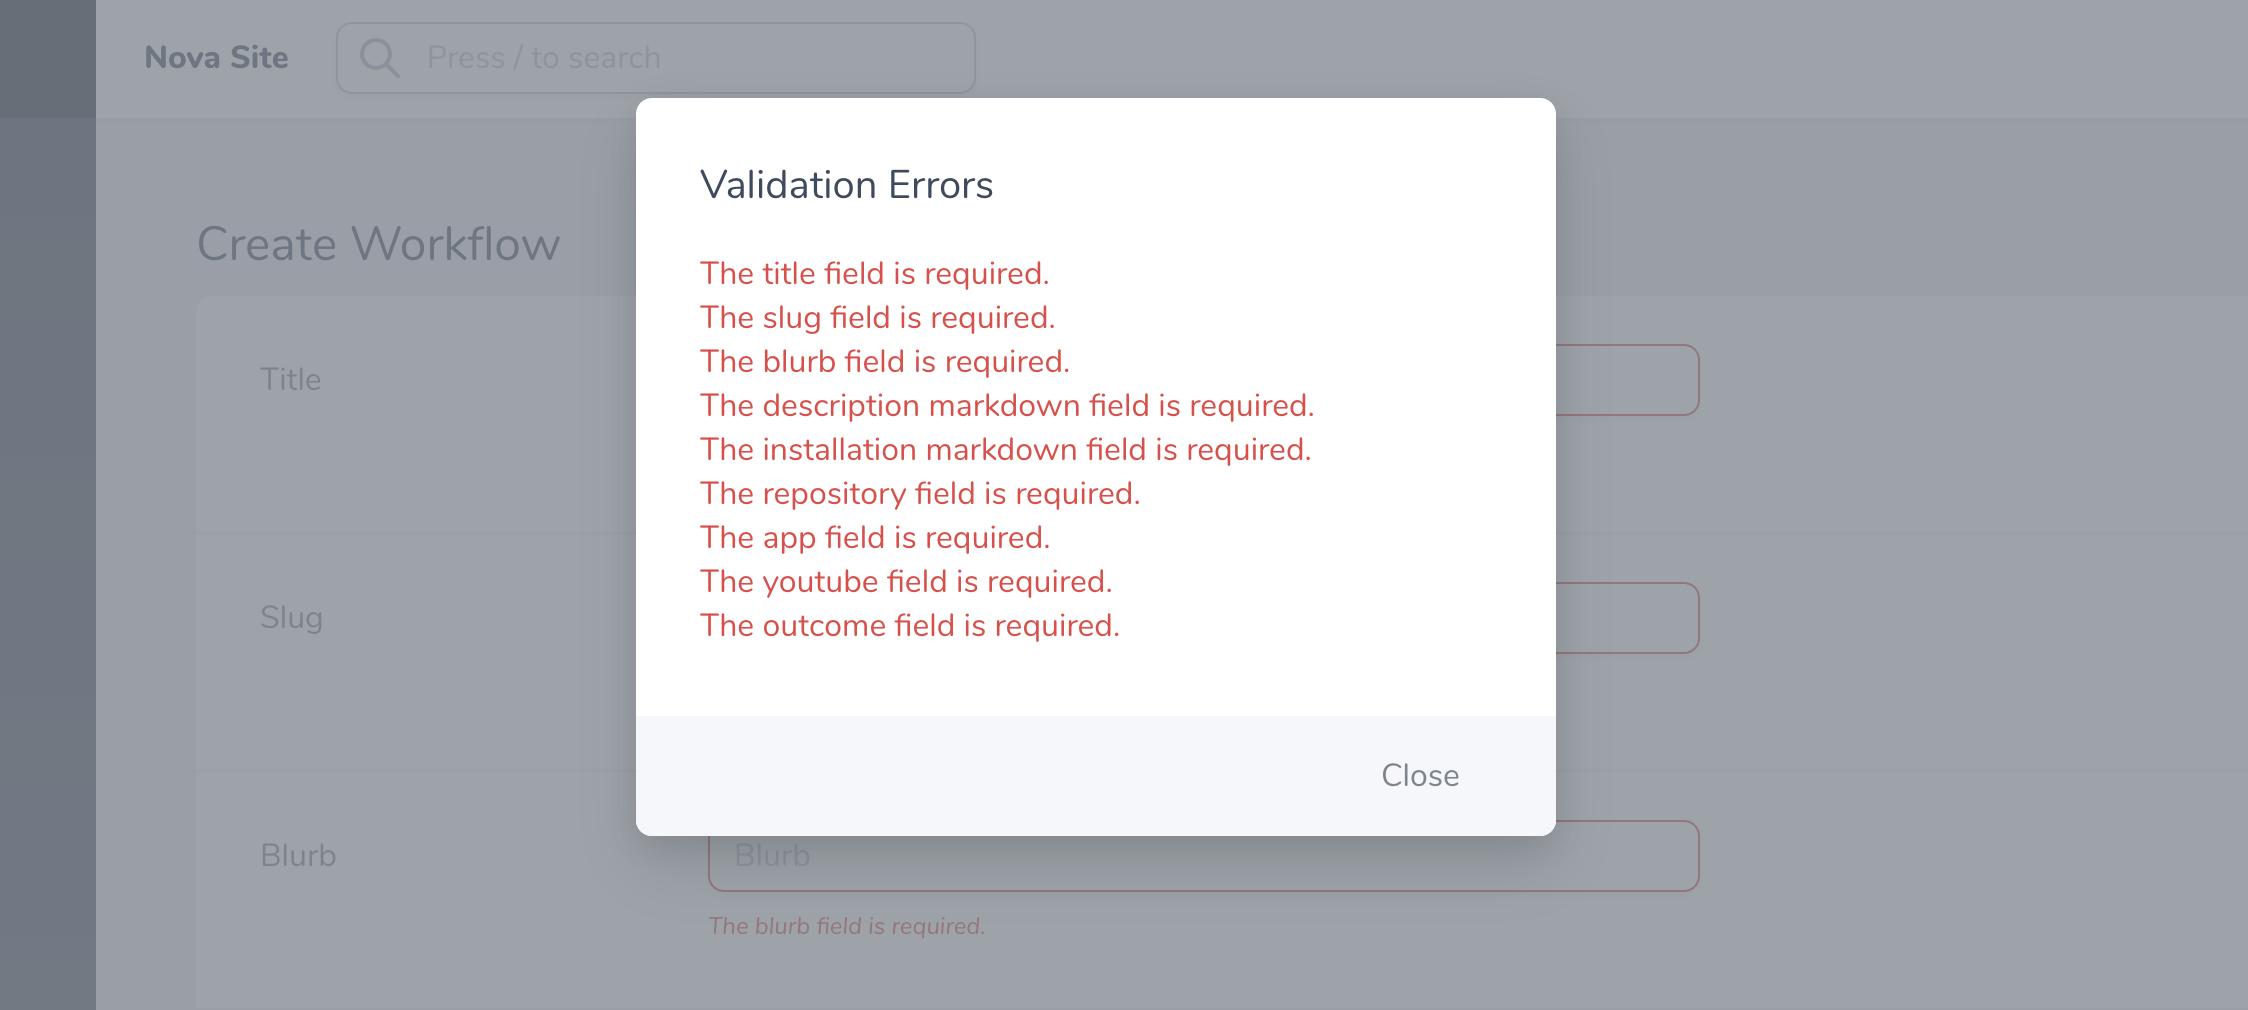 Laravel Nova Validation Error Package